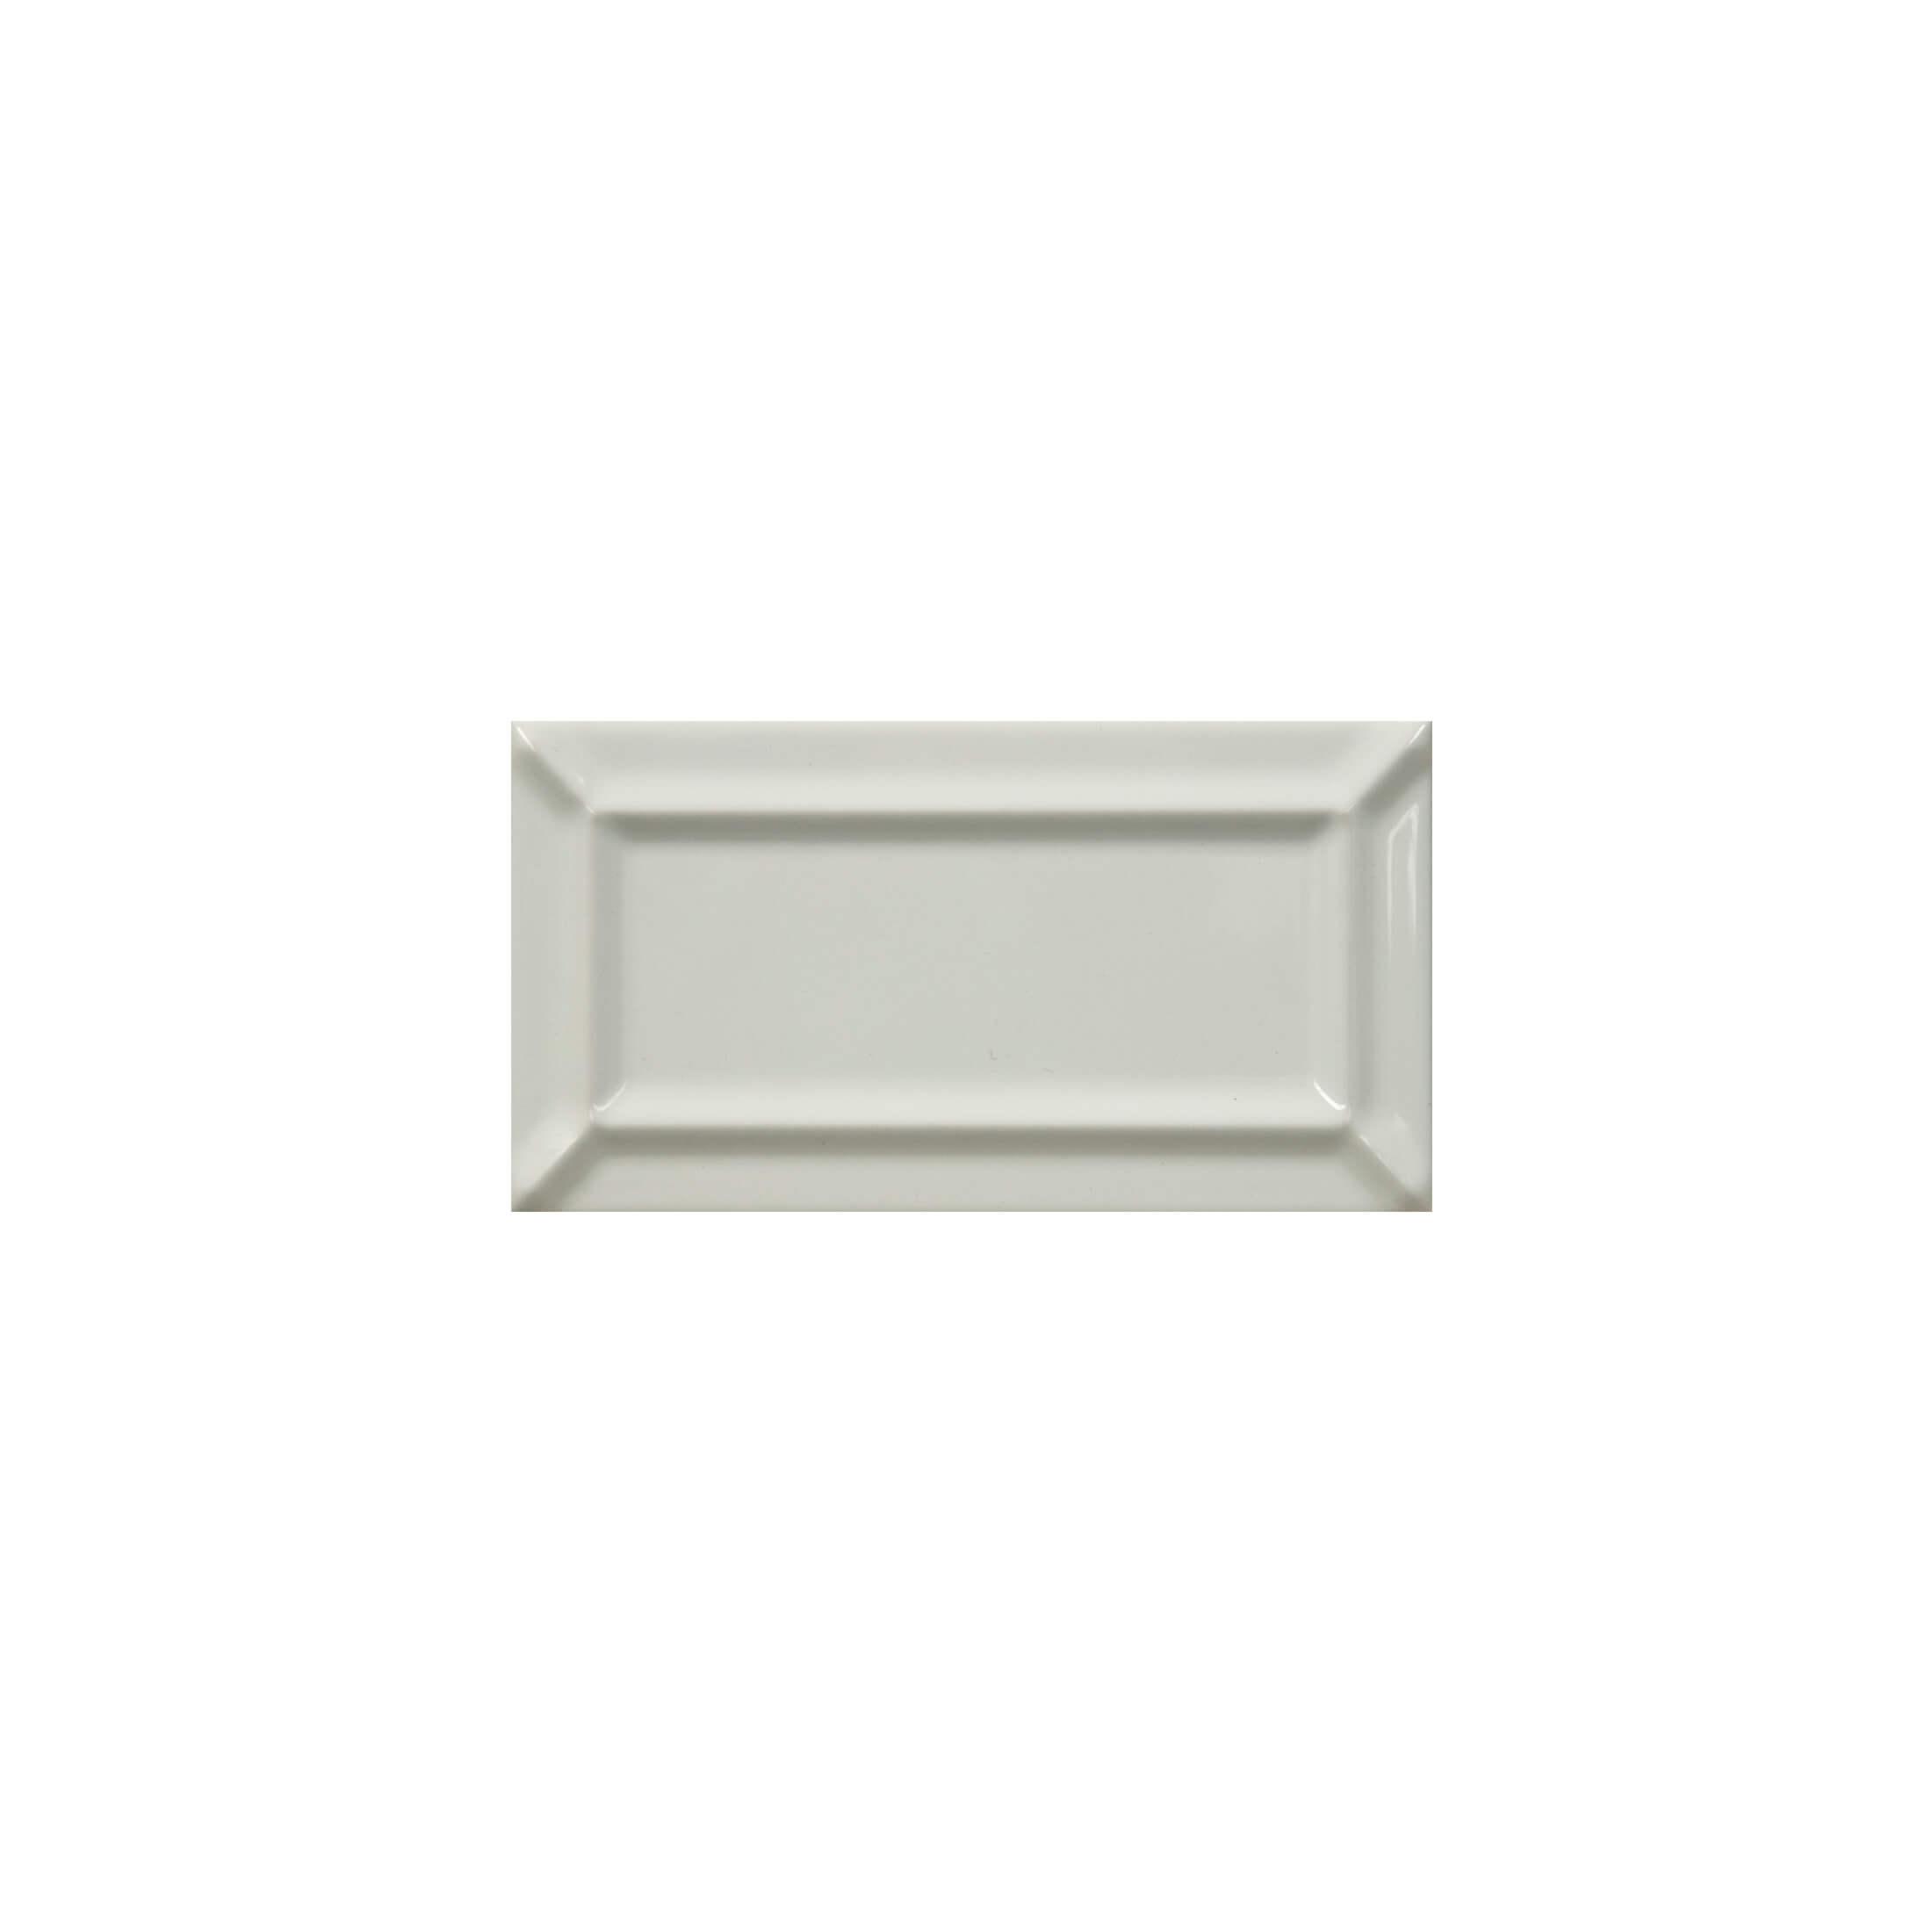 ADNE1106 - LISO EDGE - 7.5 cm X 15 cm